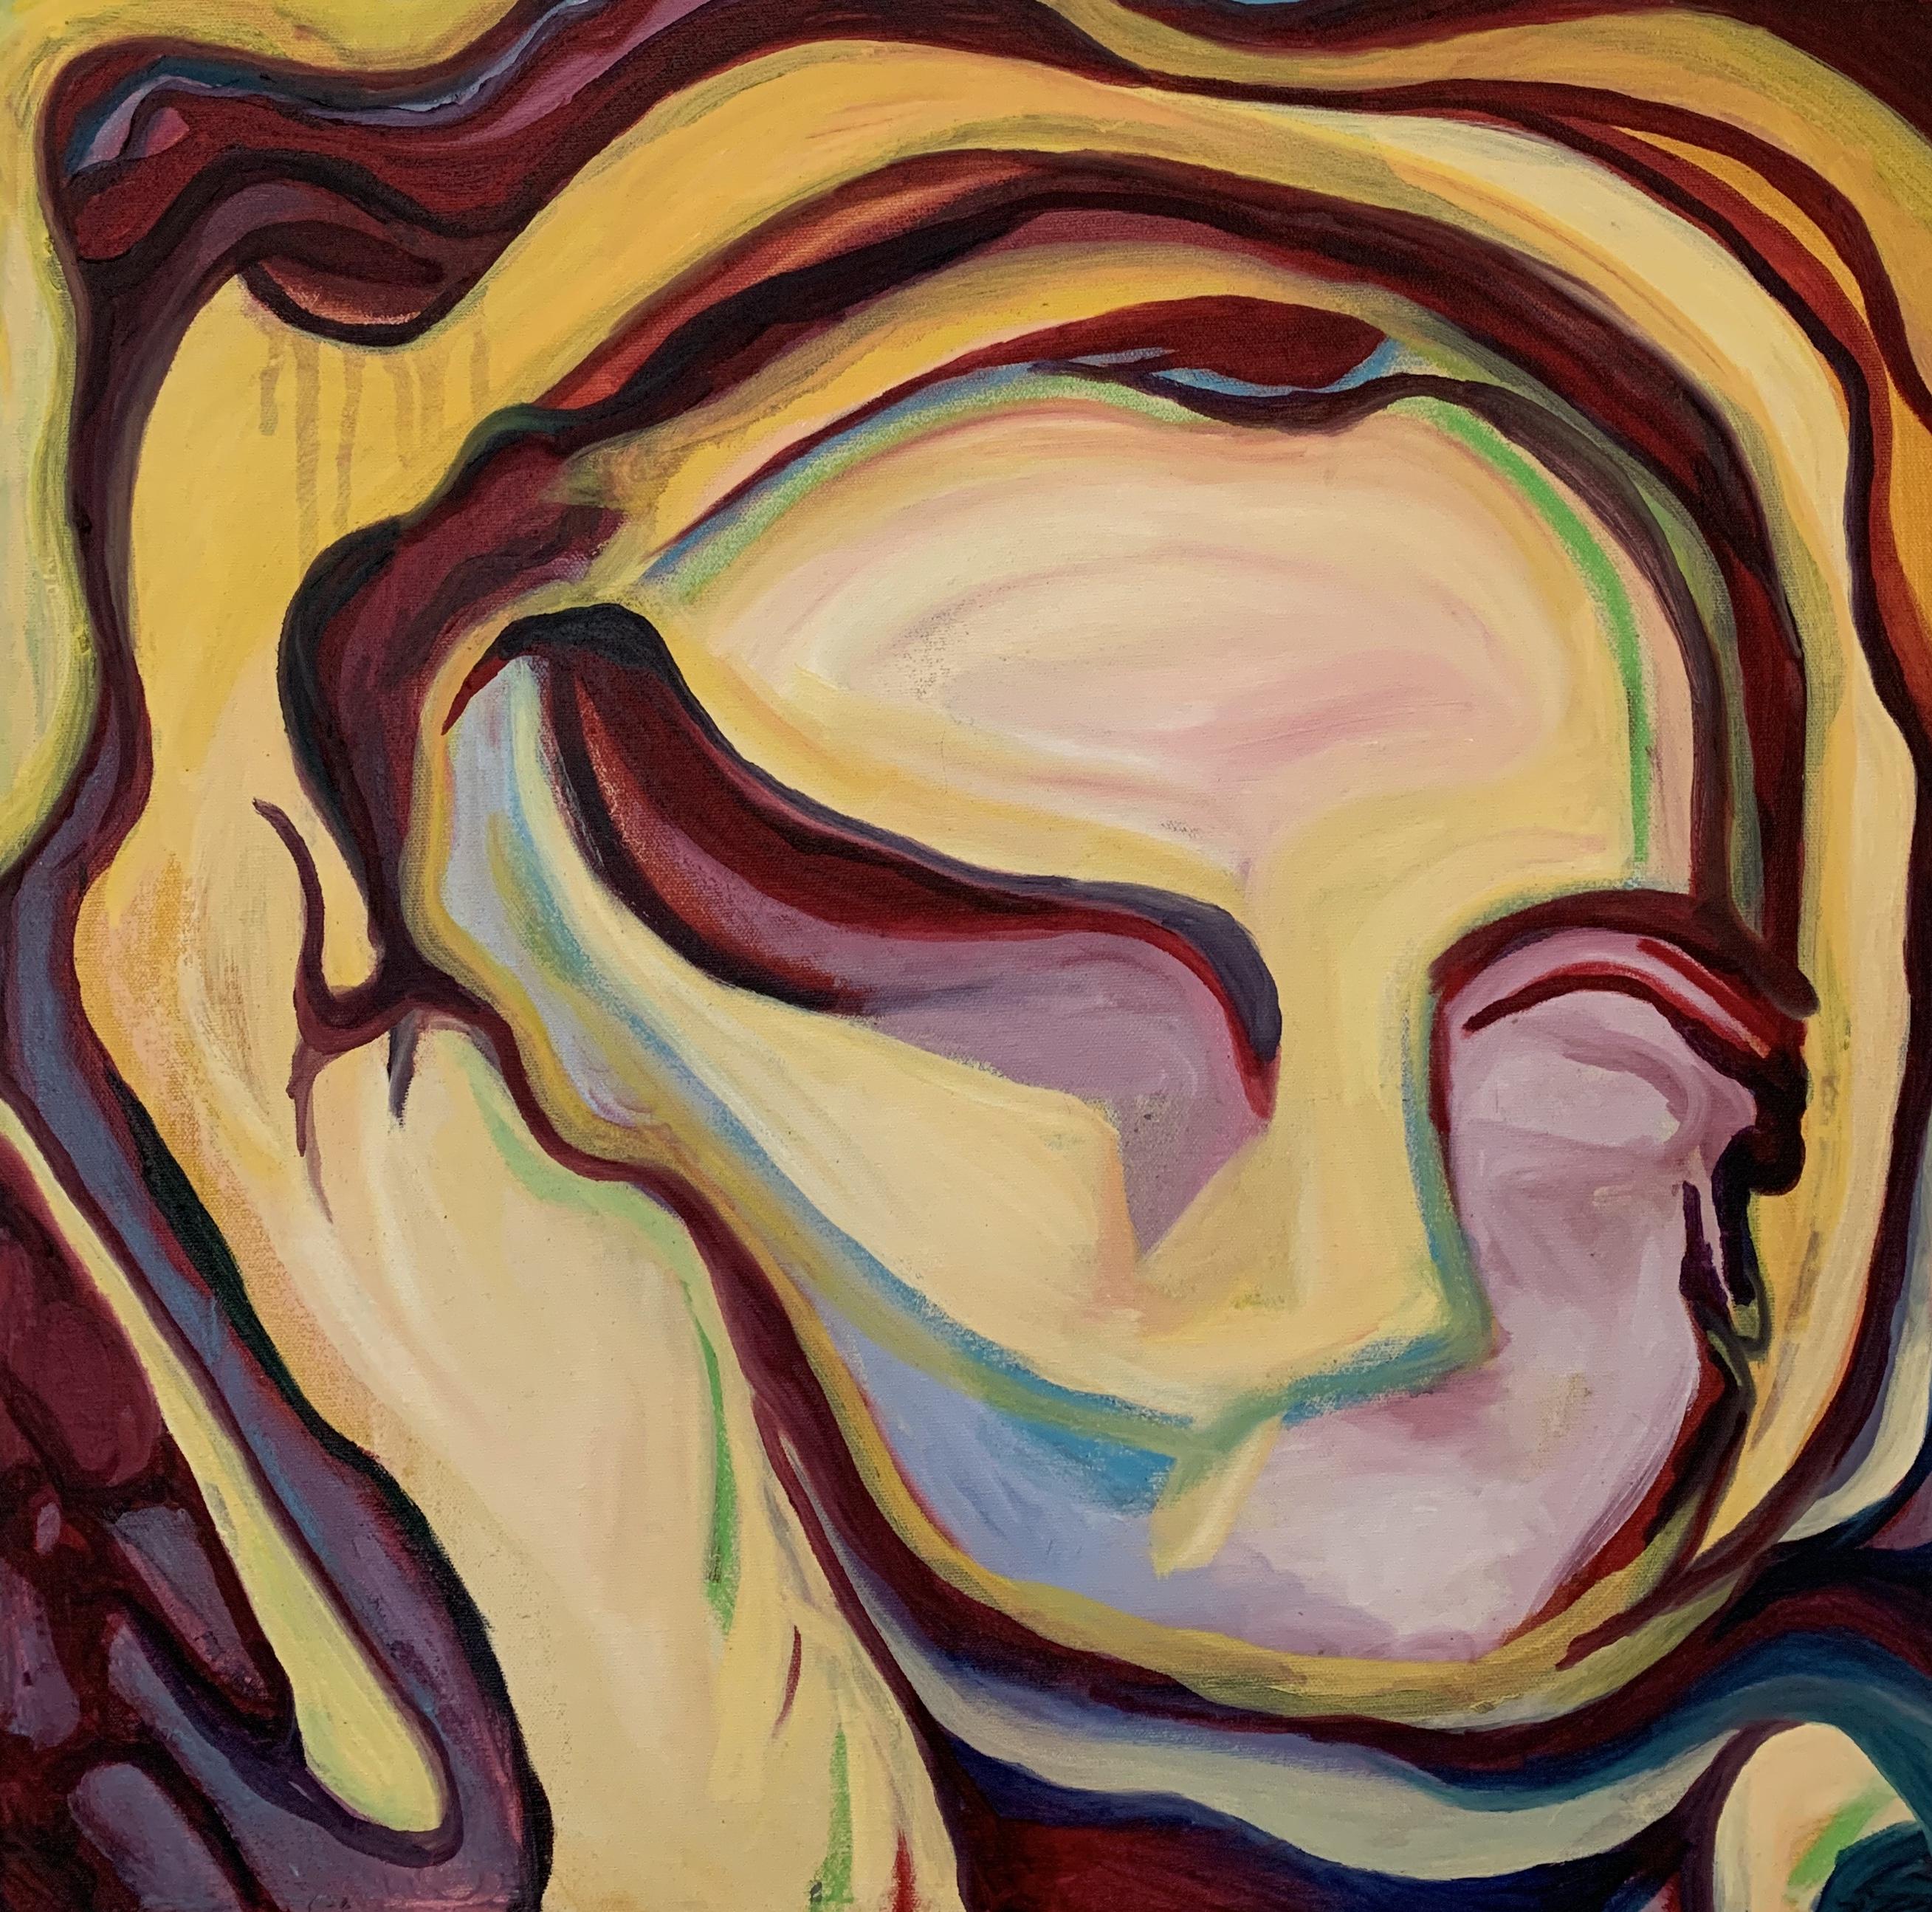 Charlotte Mouquin - Mask 1 20x20in- oil